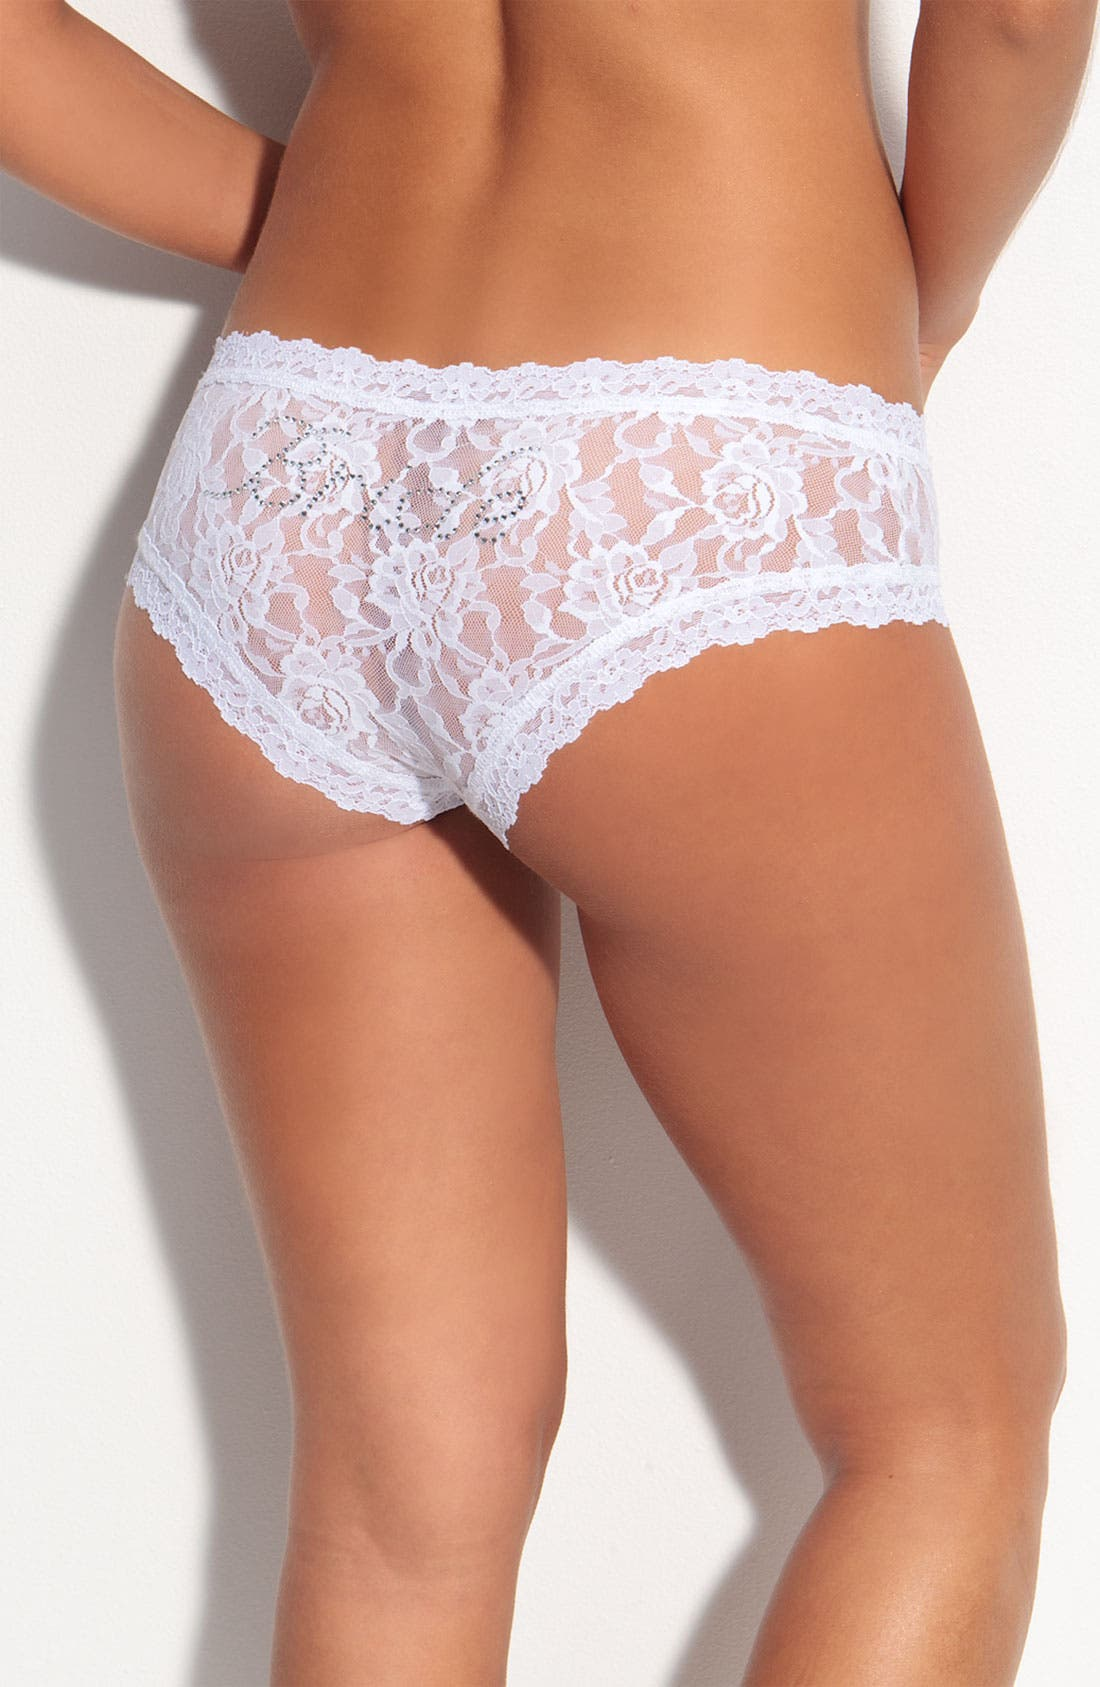 Main Image - Hanky Panky 'Bride' Lace Hipster Panties